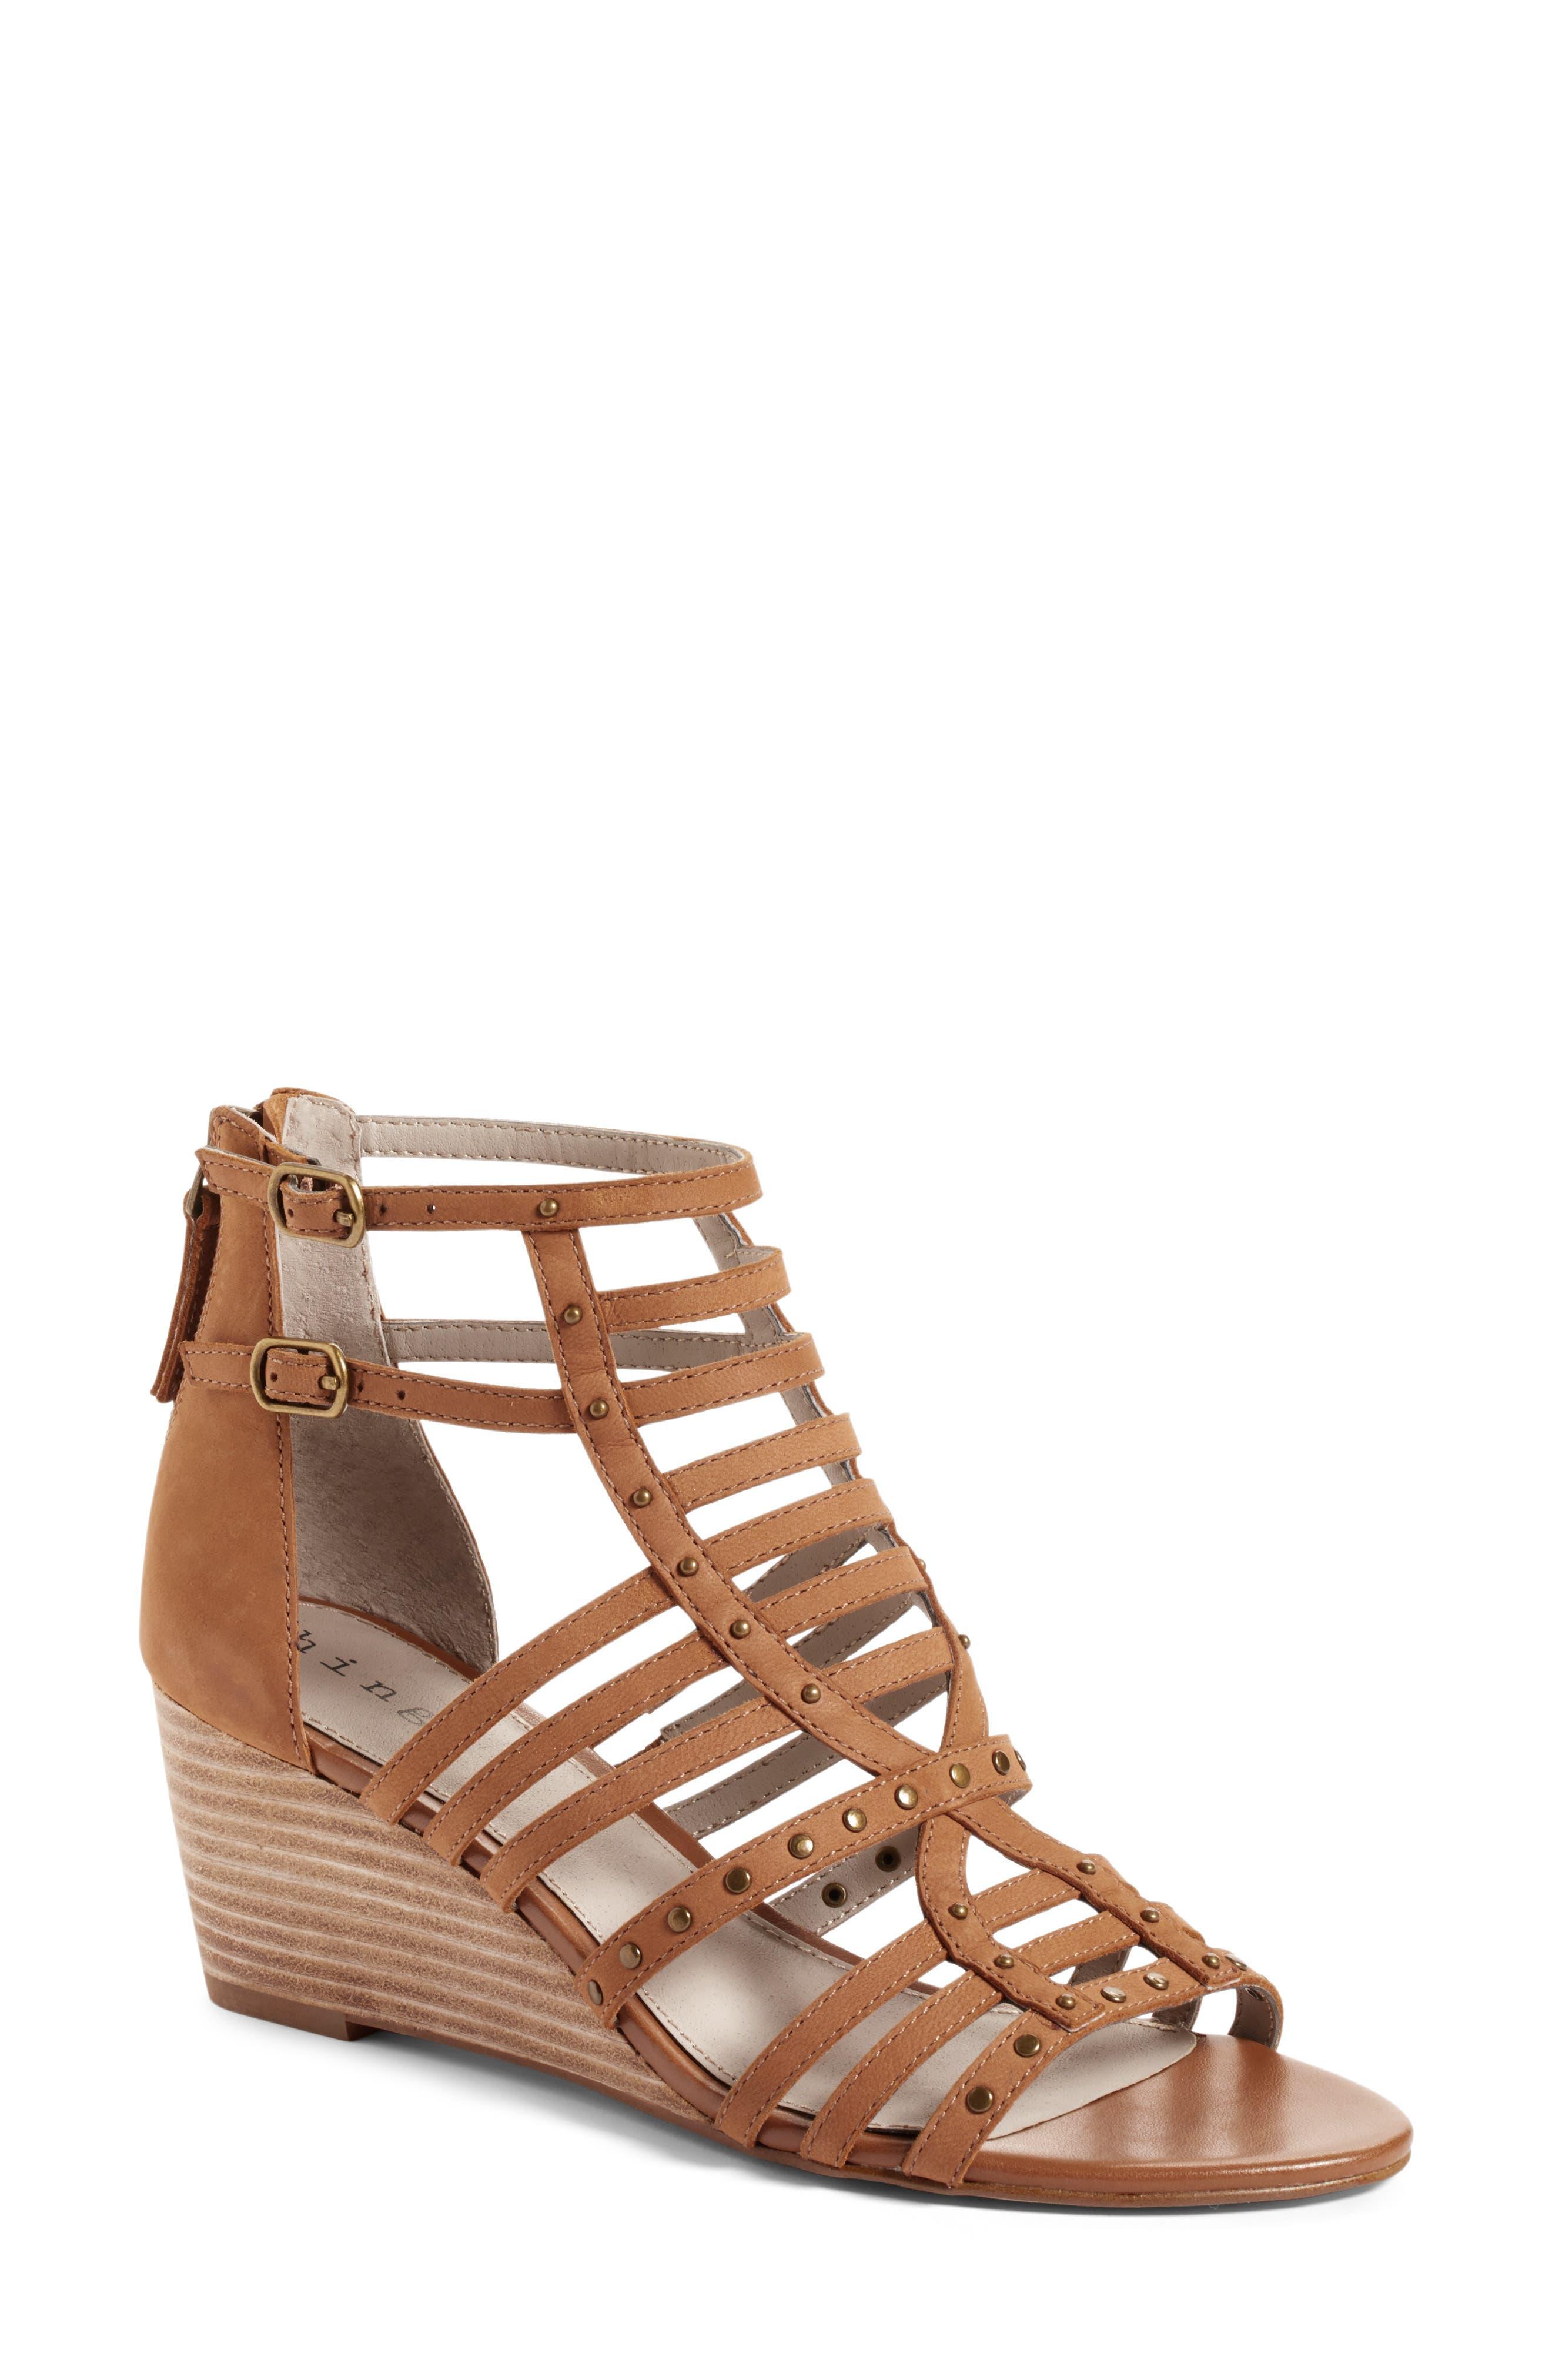 Alternate Image 1 Selected - Hinge Nolan Strappy Wedge Sandal (Women)